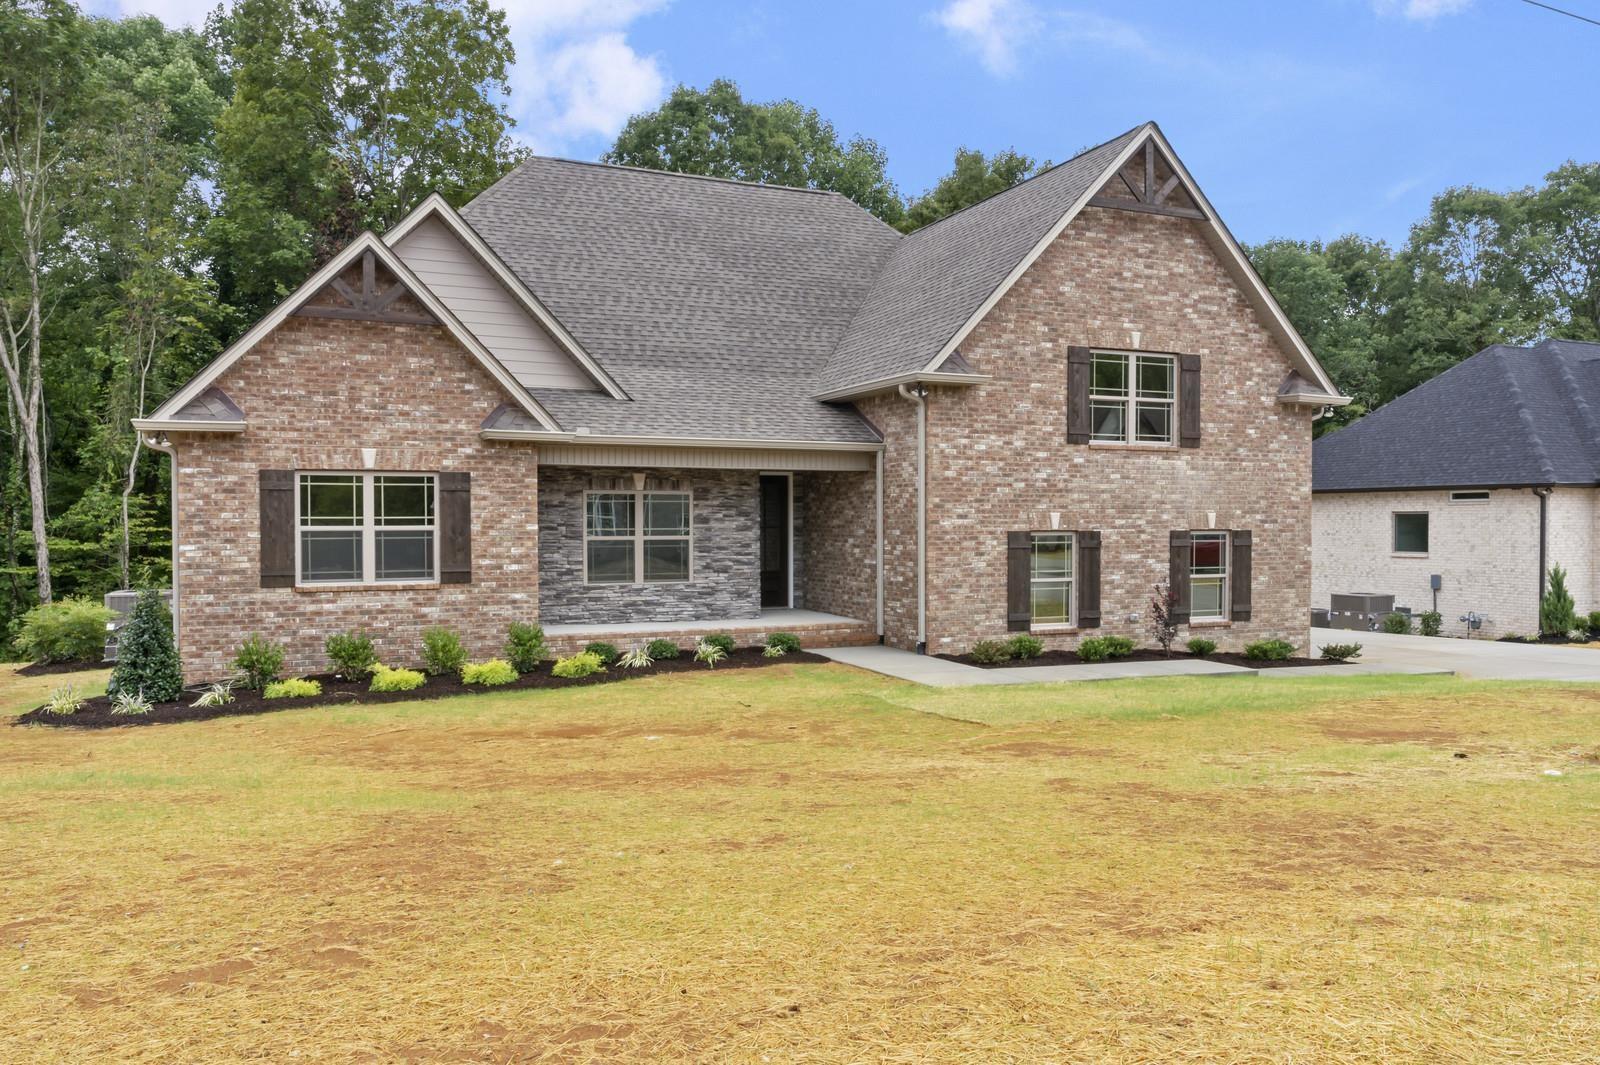 3204 Bristol Lane, Greenbrier, TN 37073 - Greenbrier, TN real estate listing